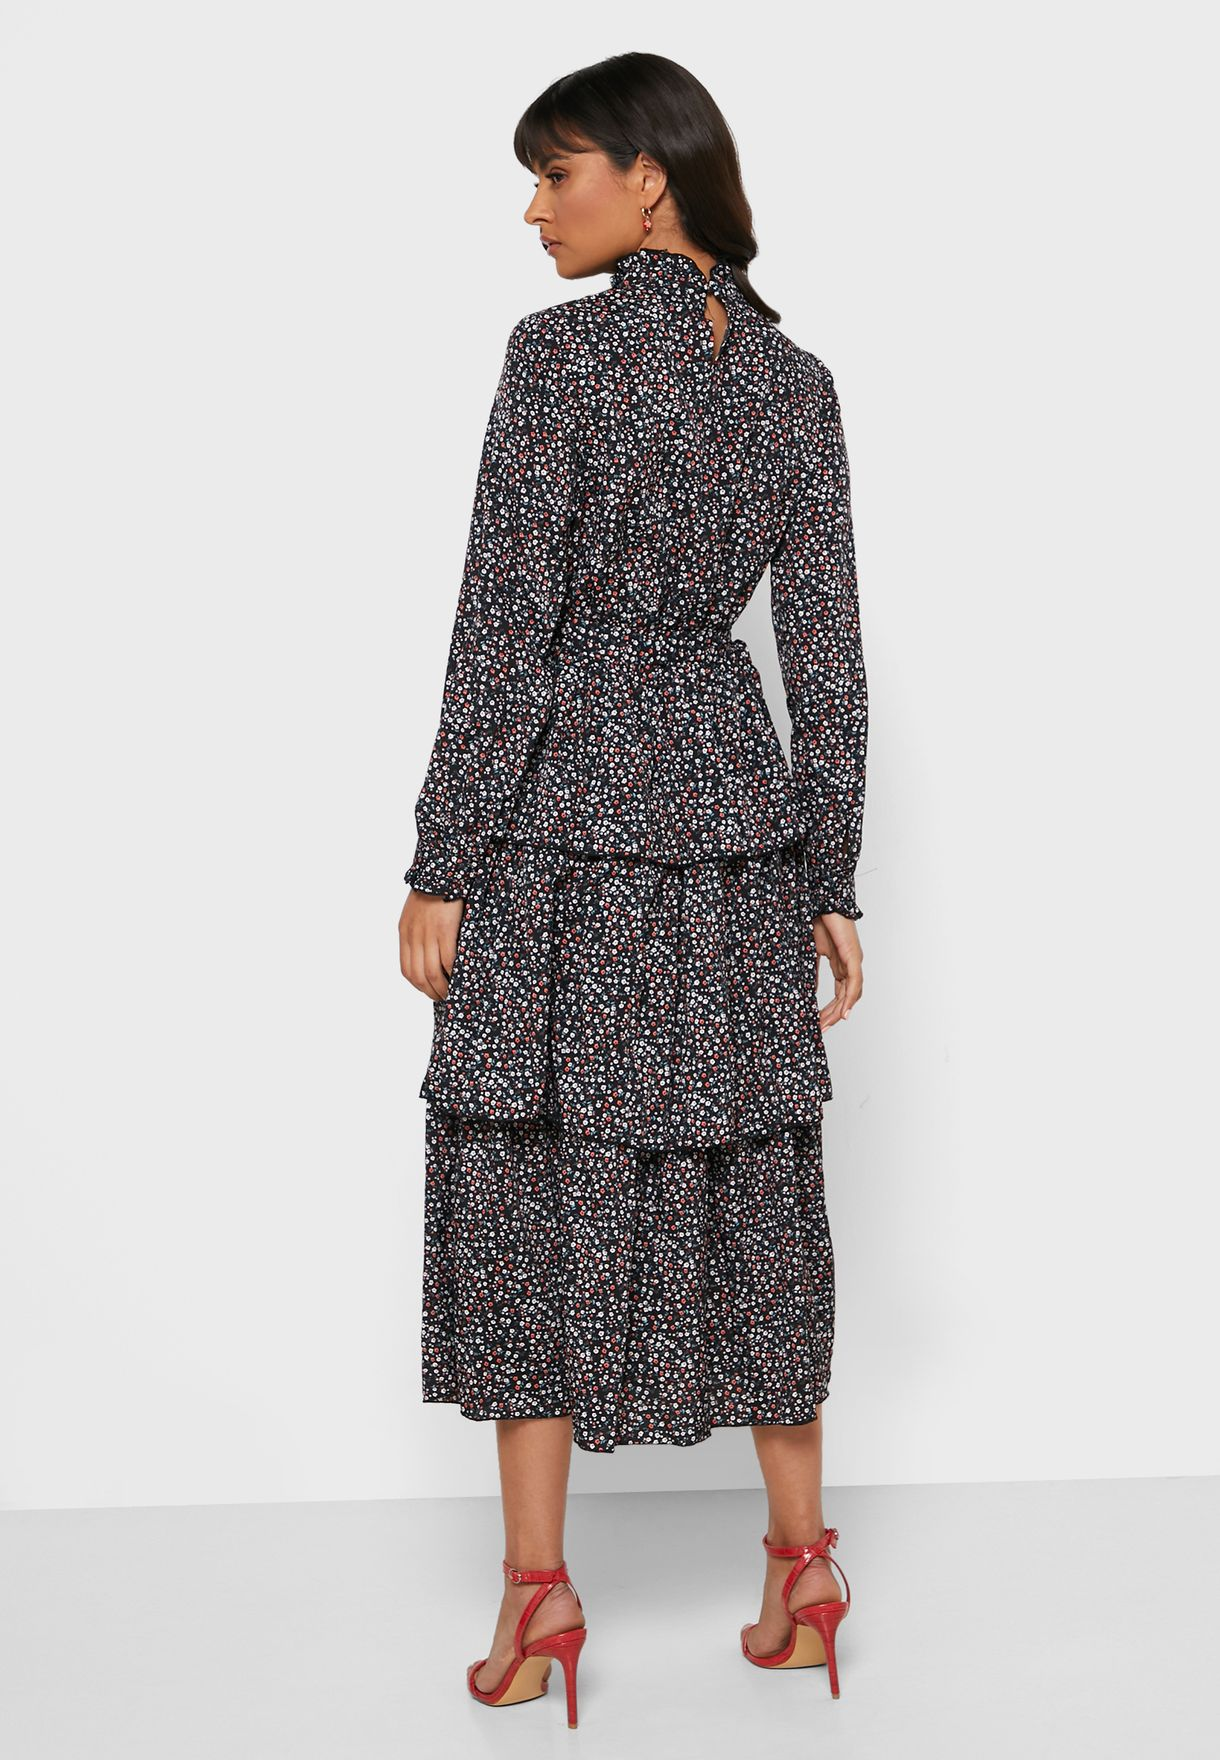 Printed Tiered Self Tie Midi Dress